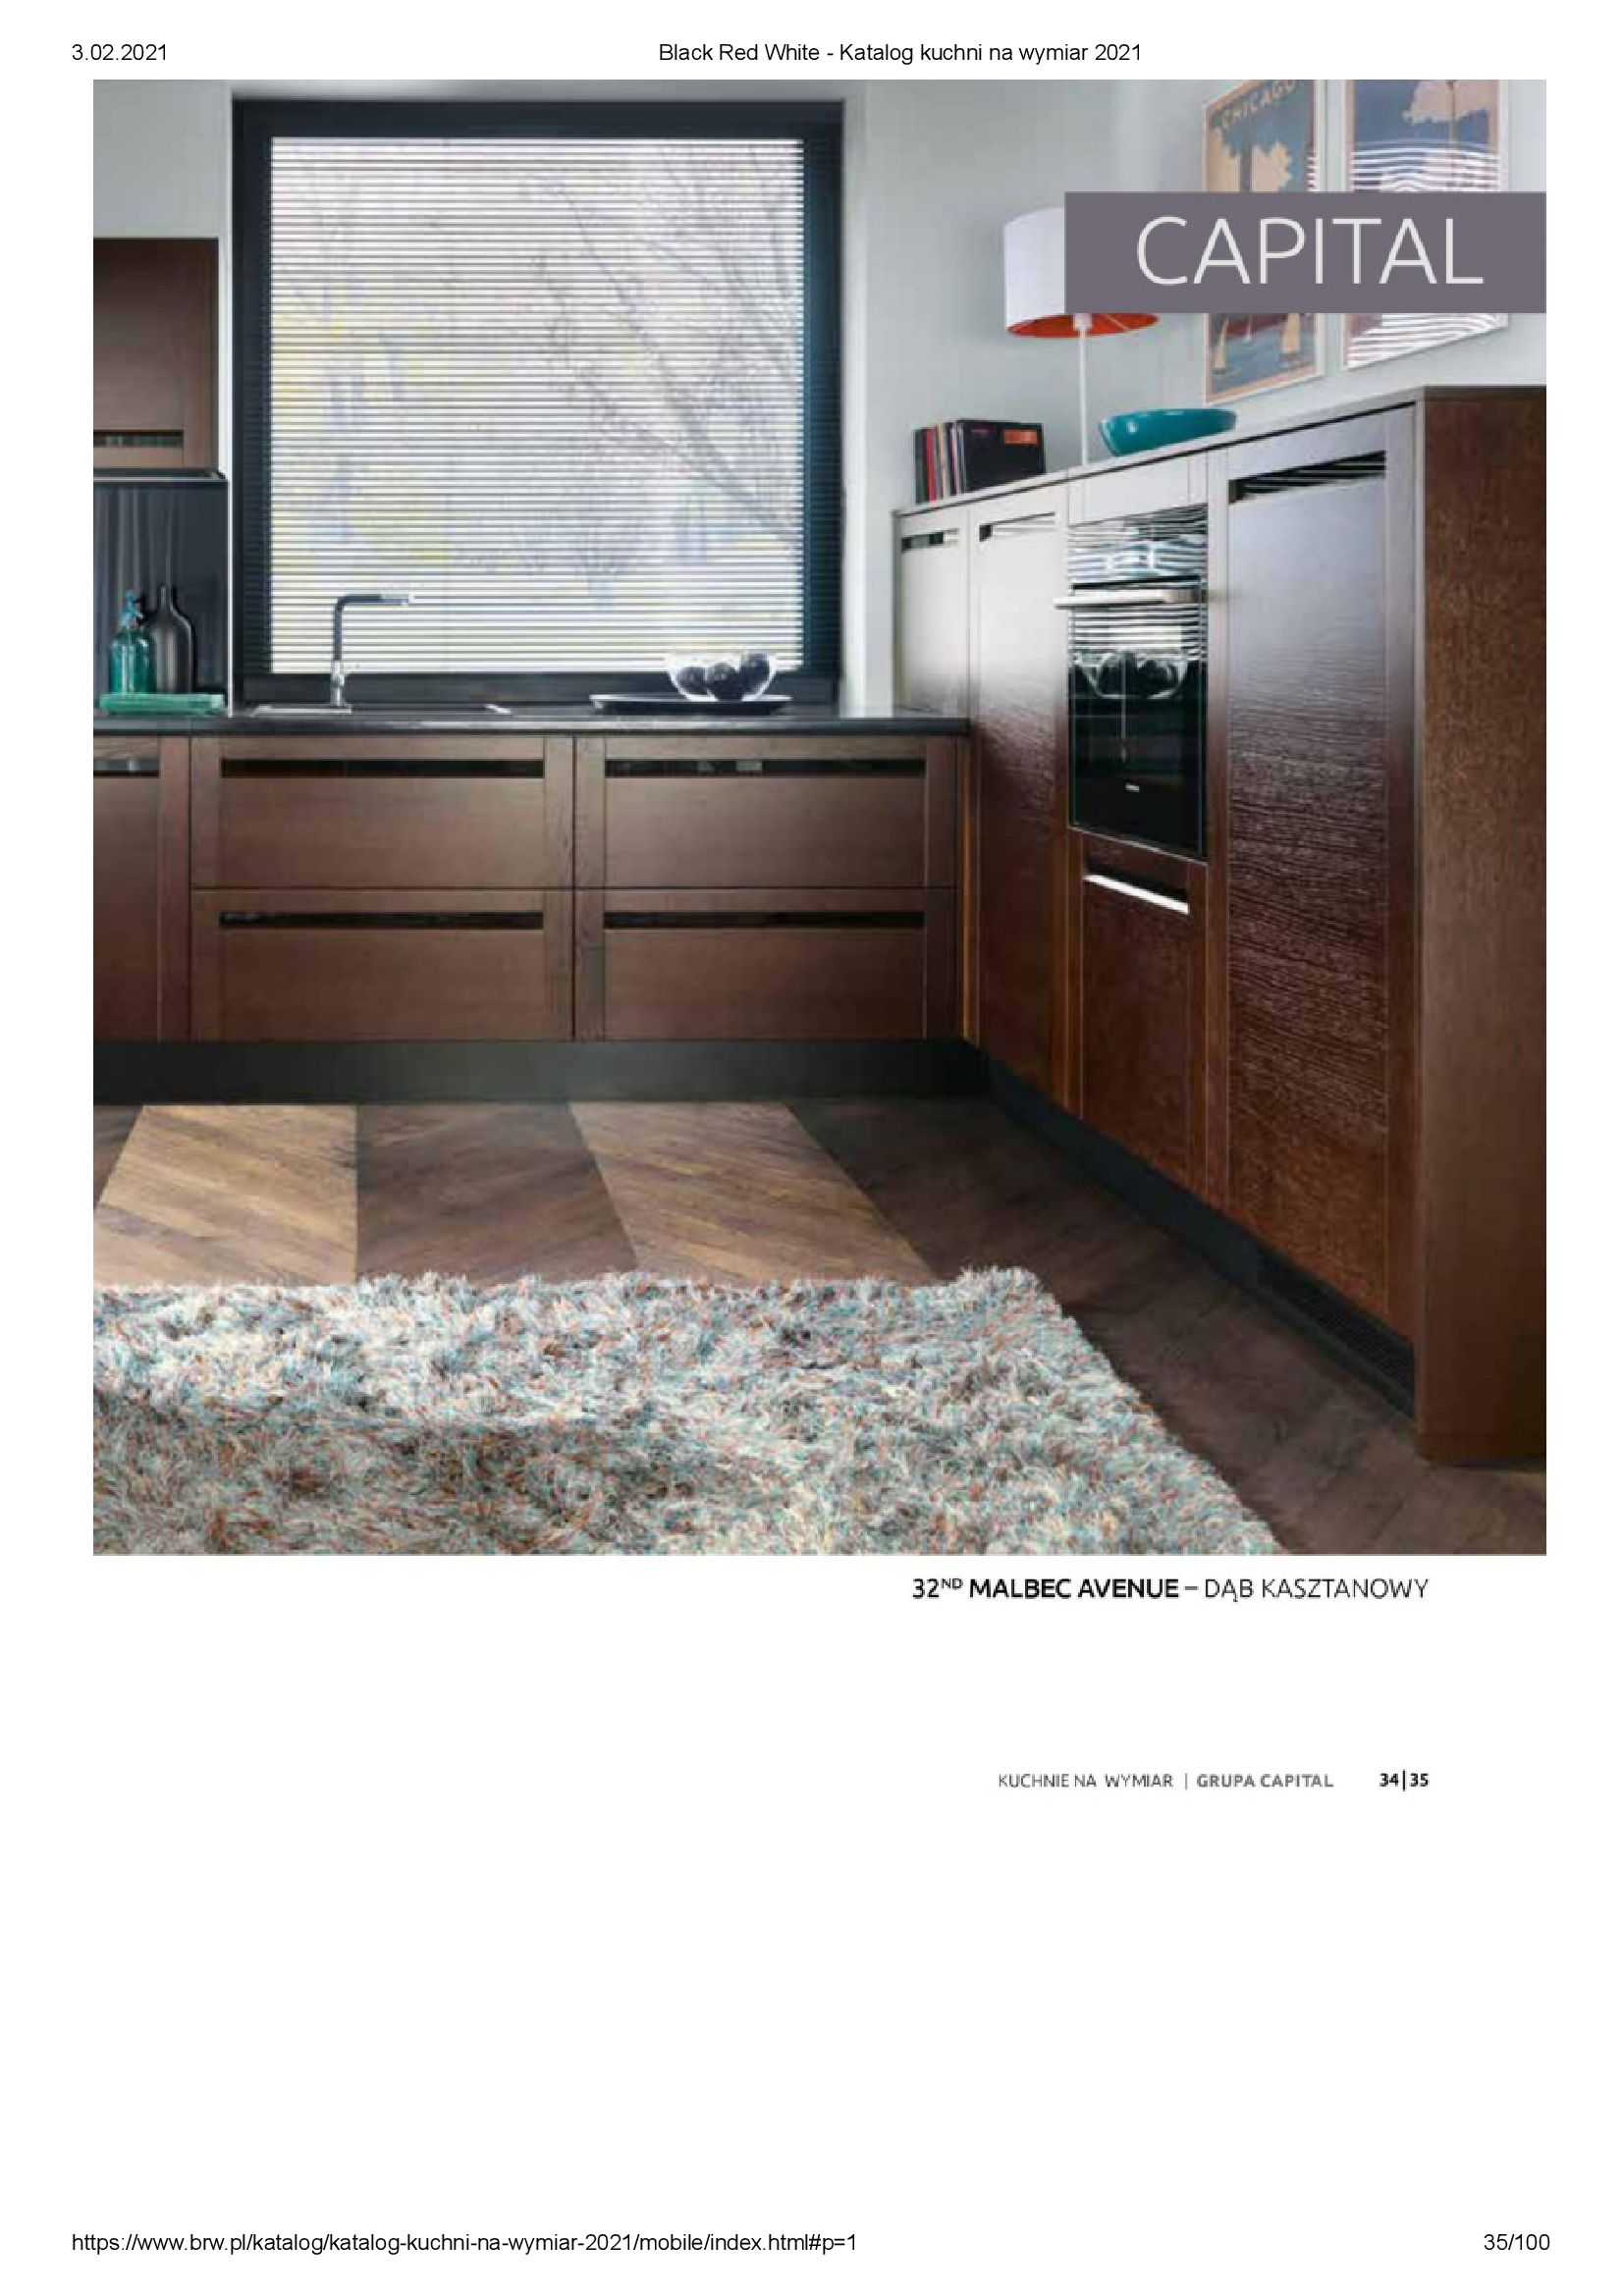 Gazetka Black Red White: Katalog - Kuchnie na wymiar Senso Kitchens 2021 2021-01-01 page-35